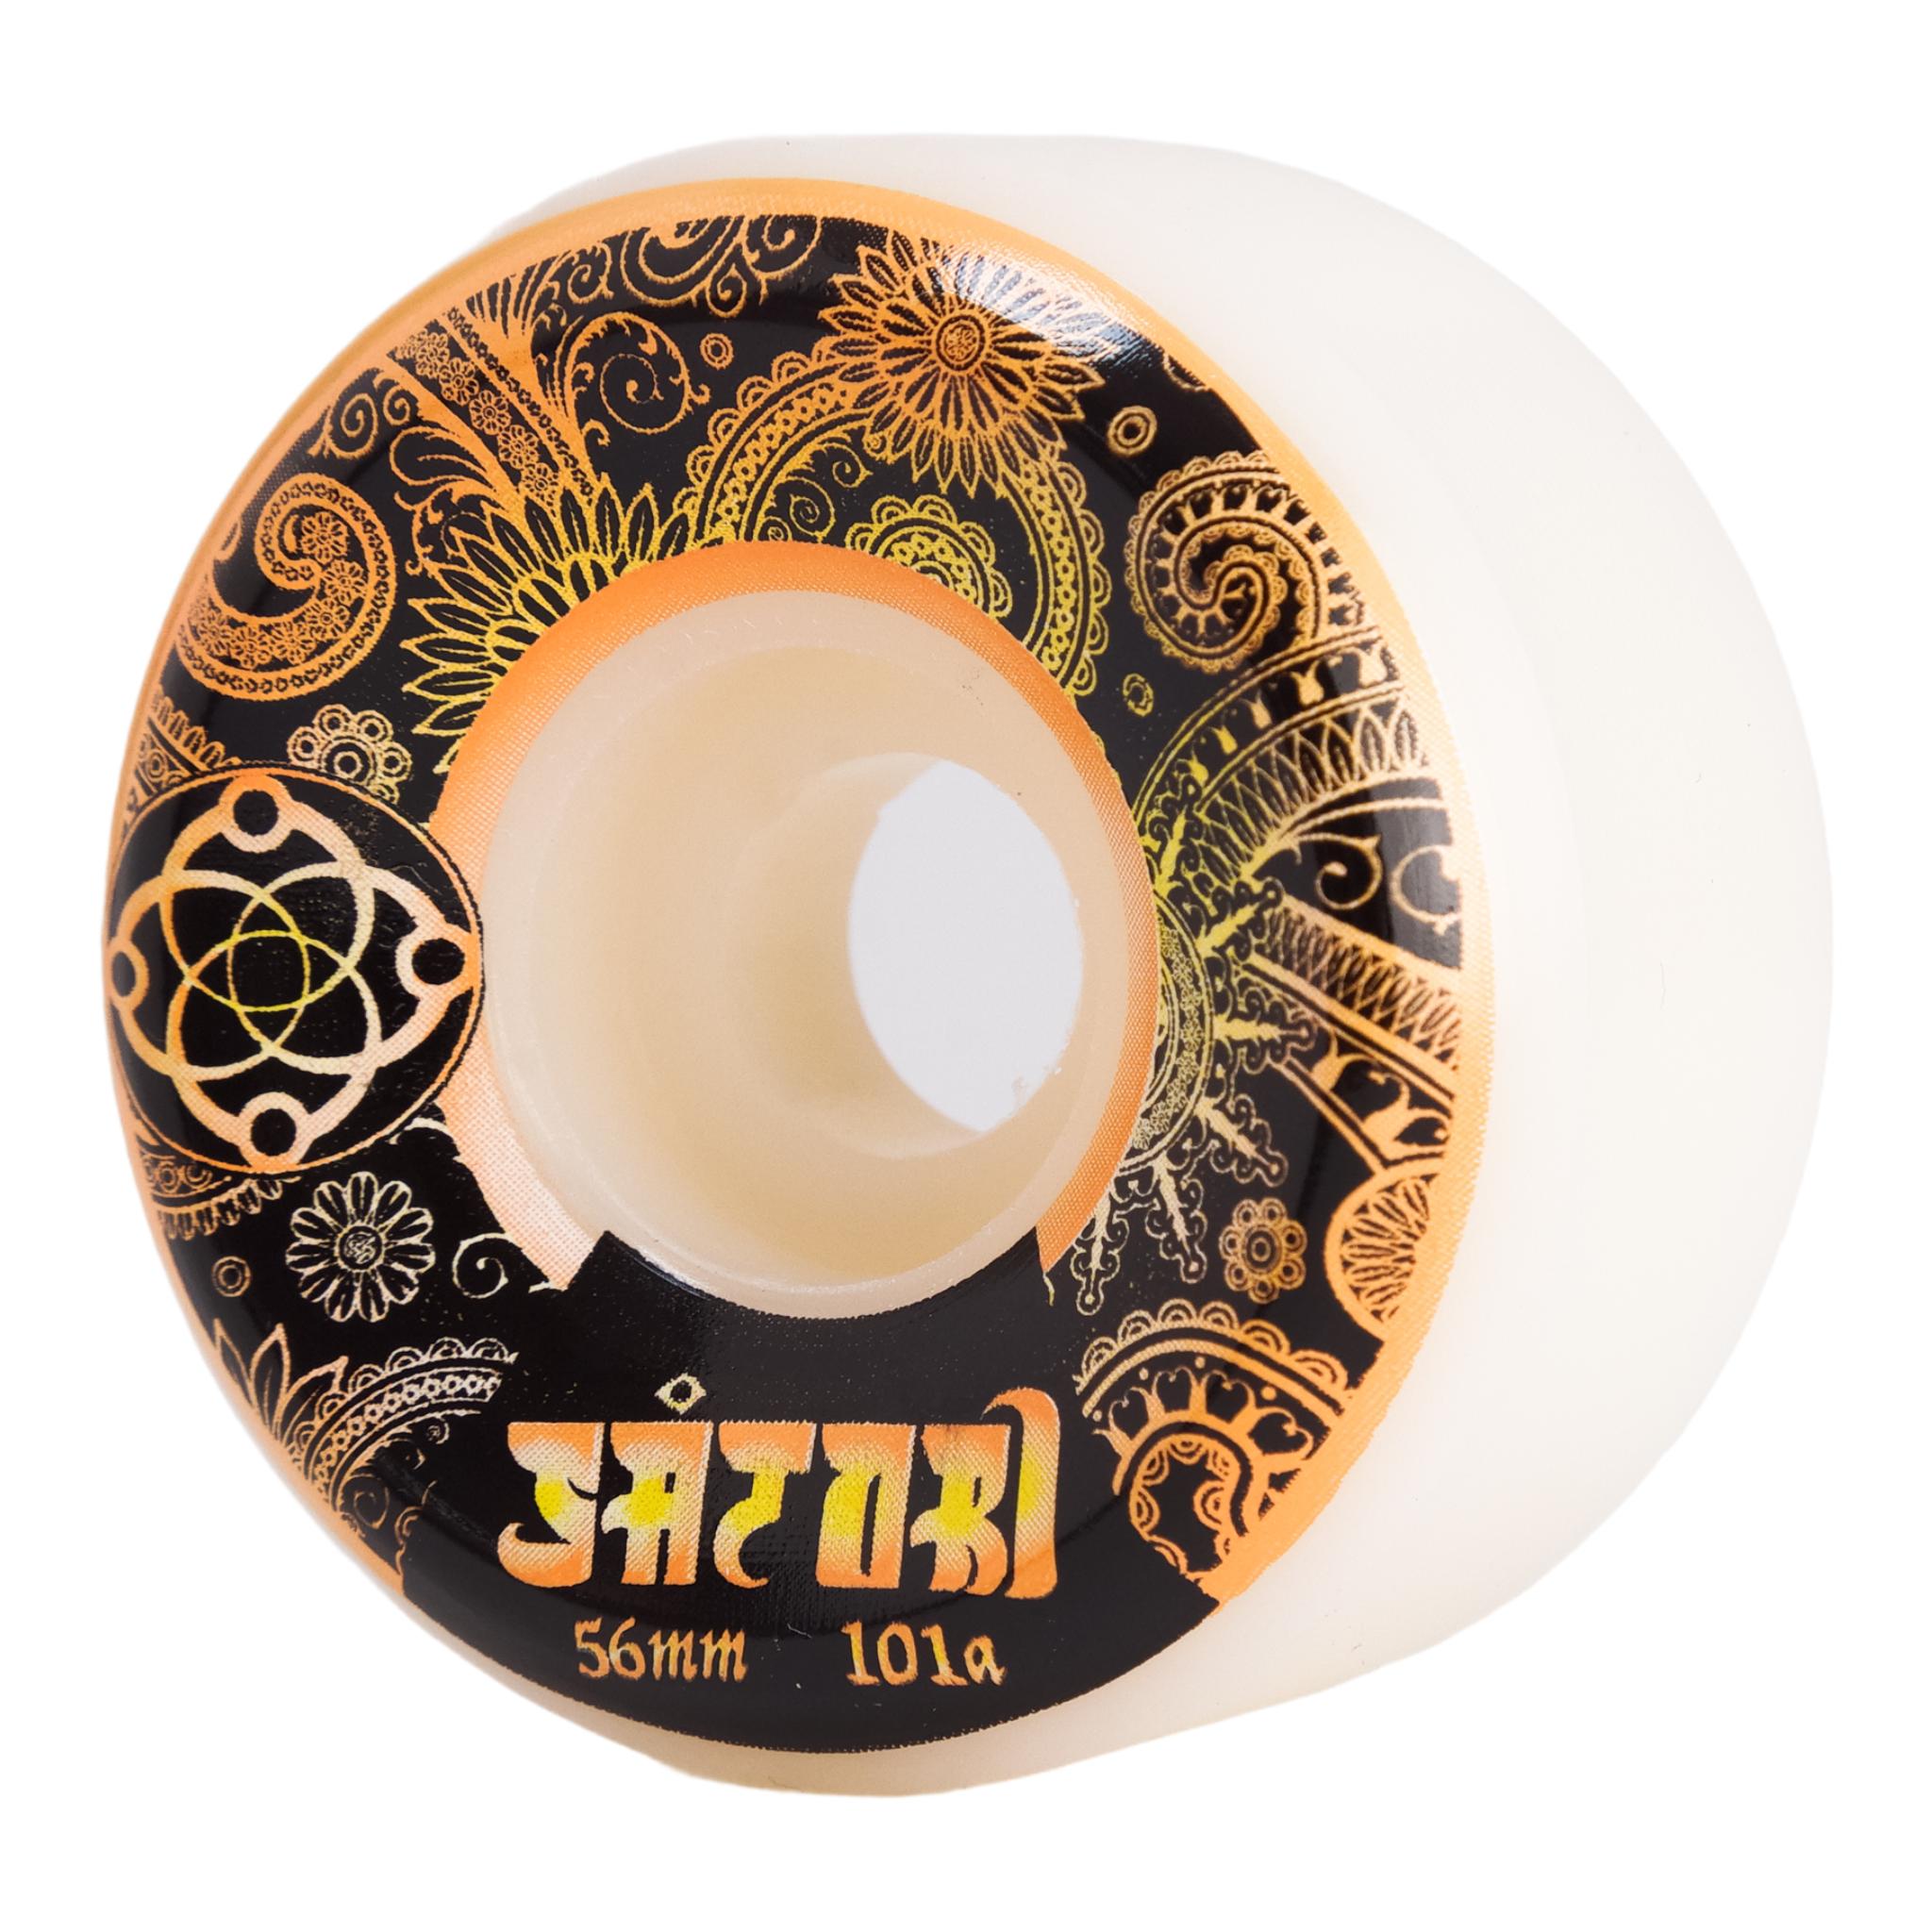 satori movement paisley link 101a conical 56mm wheels